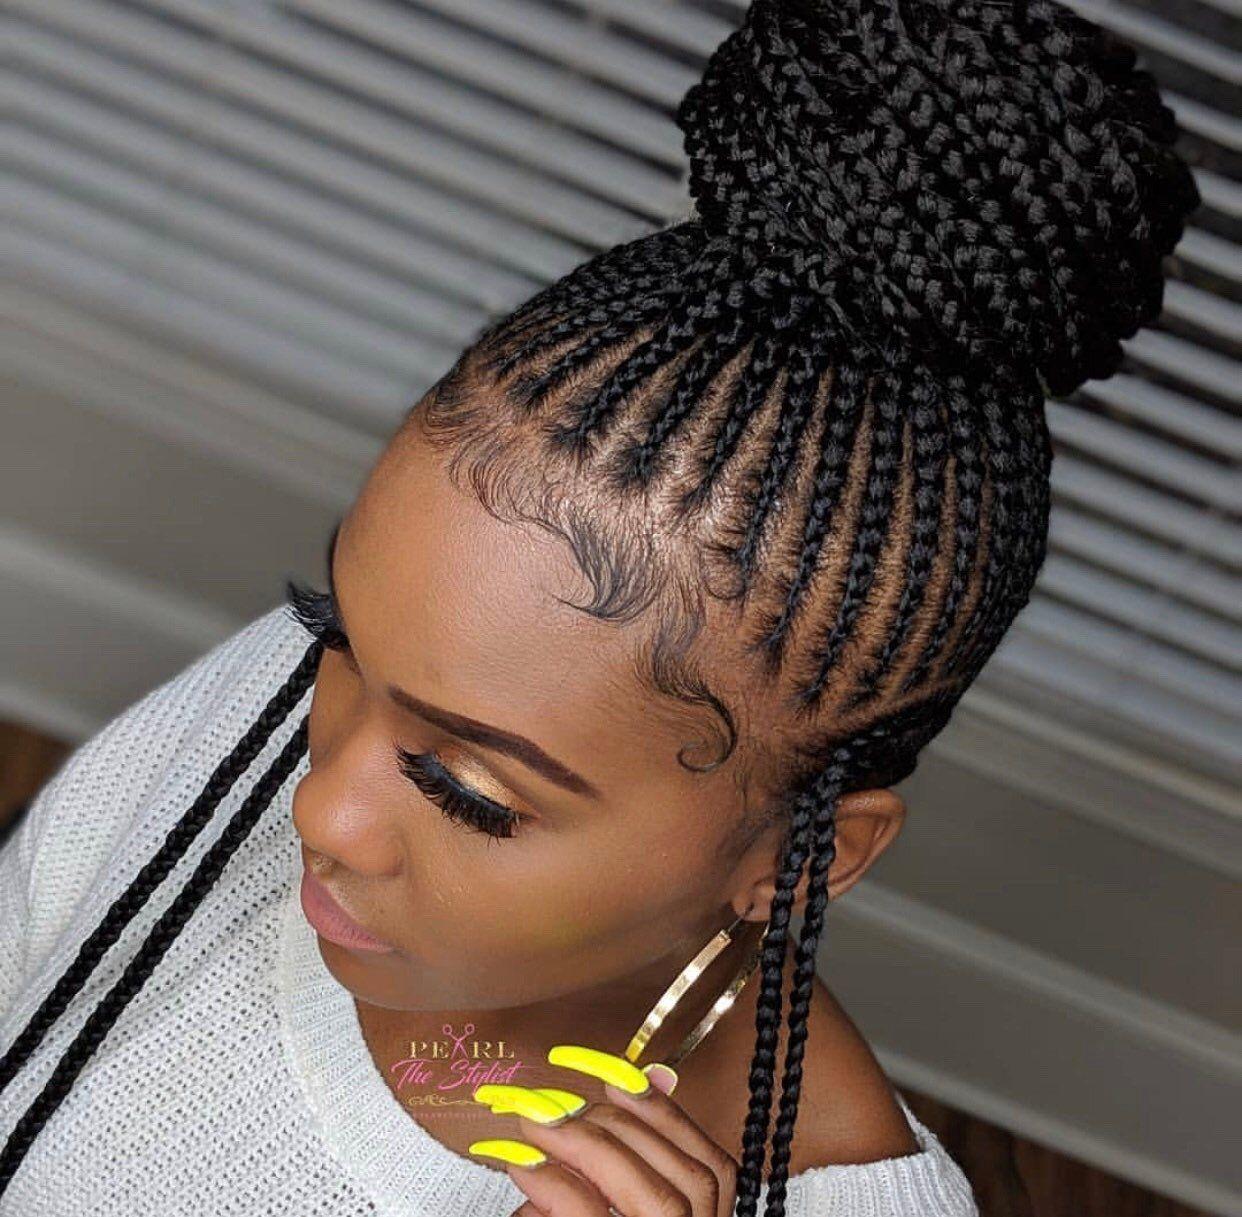 50 African Hair Braiding Styles Ideas For Extra Inspiration Thrivenaija In 2020 African Braids Hairstyles Girls Hairstyles Braids Braided Hairstyles